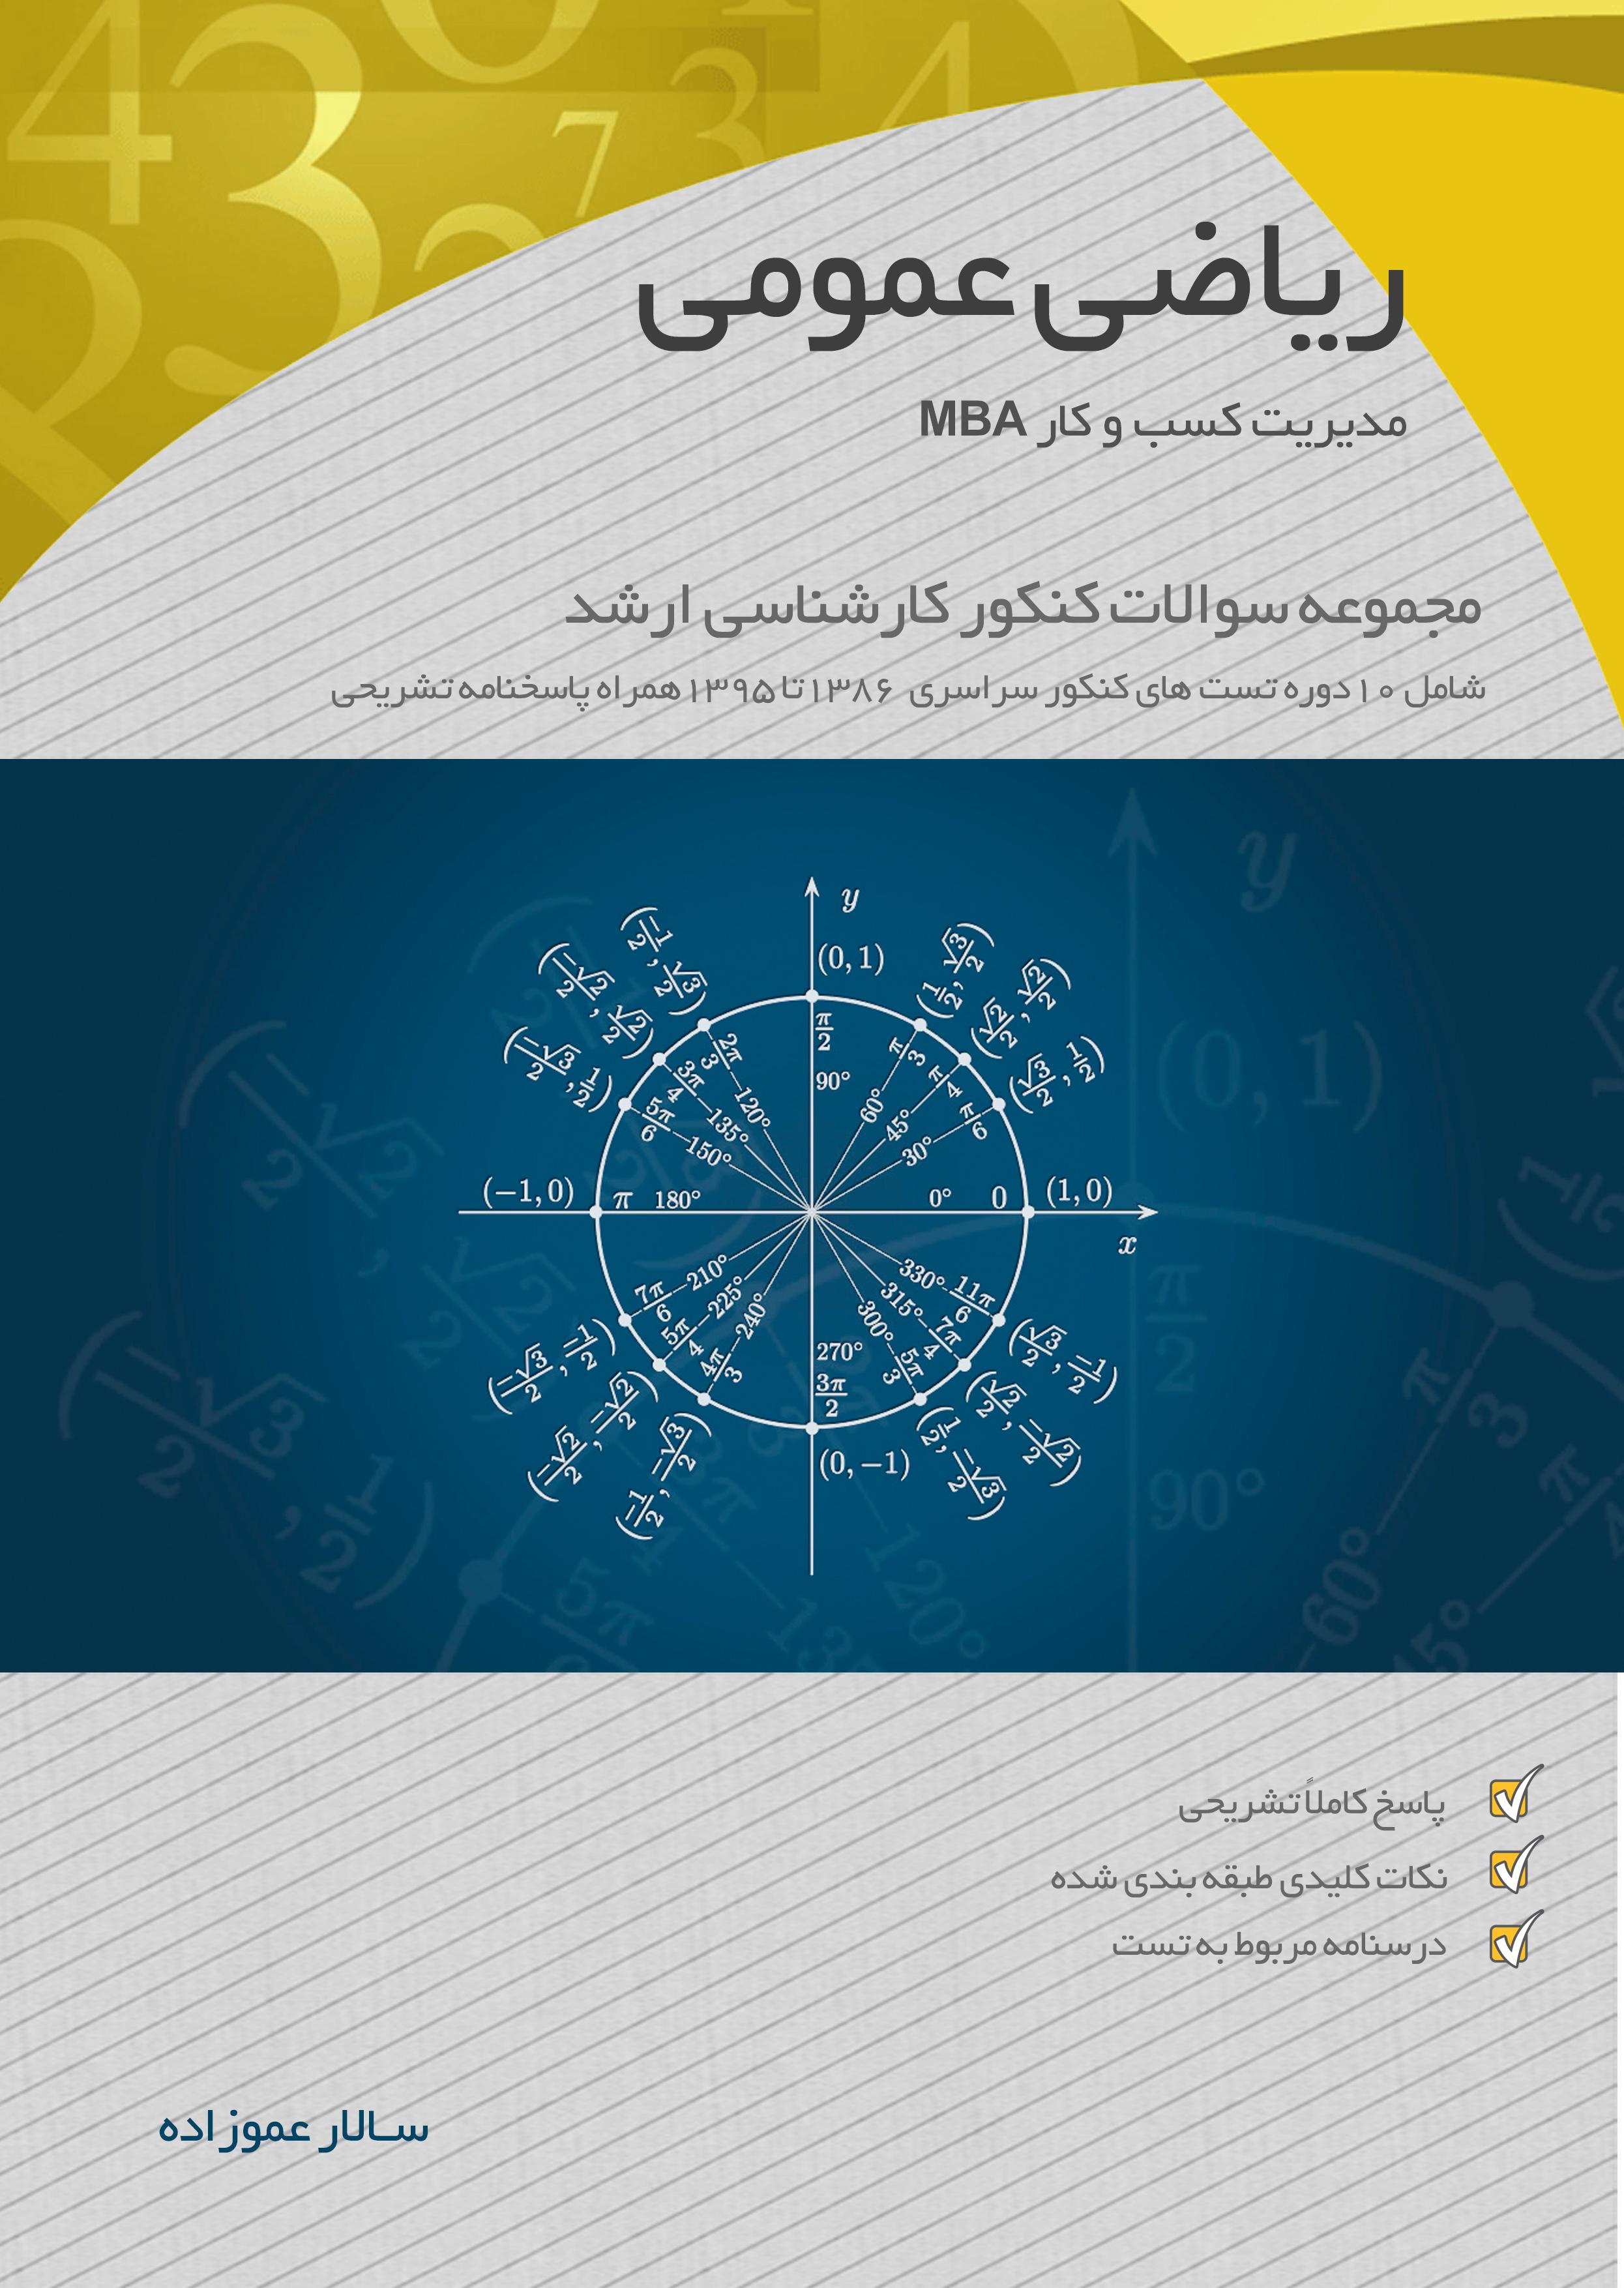 کنکور کارشناسی ارشدMBA _ ریاضی عمومی(1)